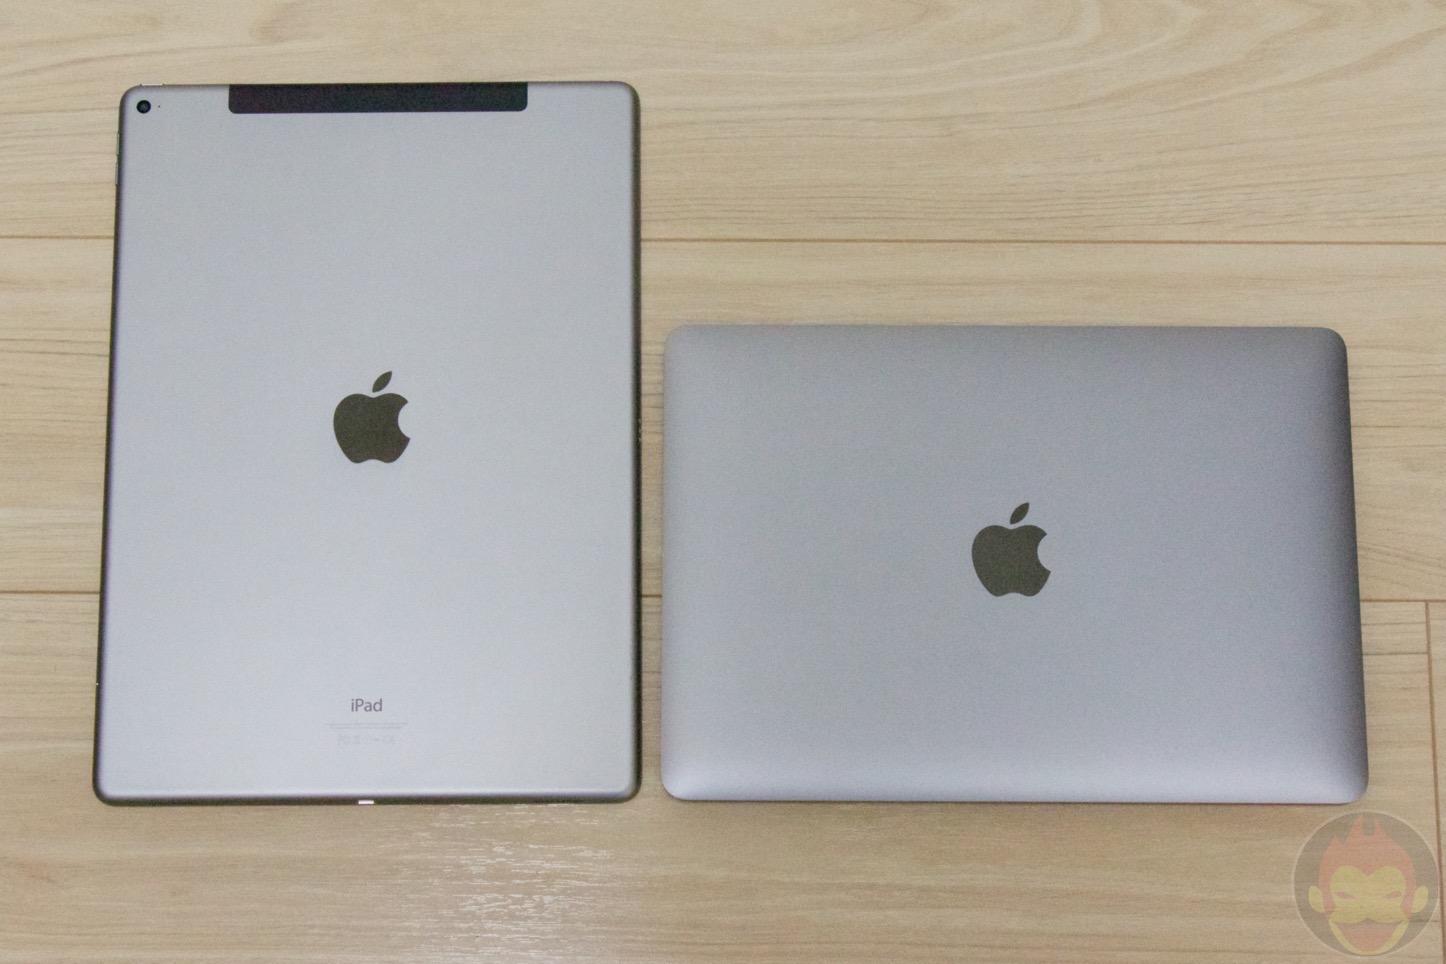 iPad-Pro-Review-MacBook-Comparison-04.jpg